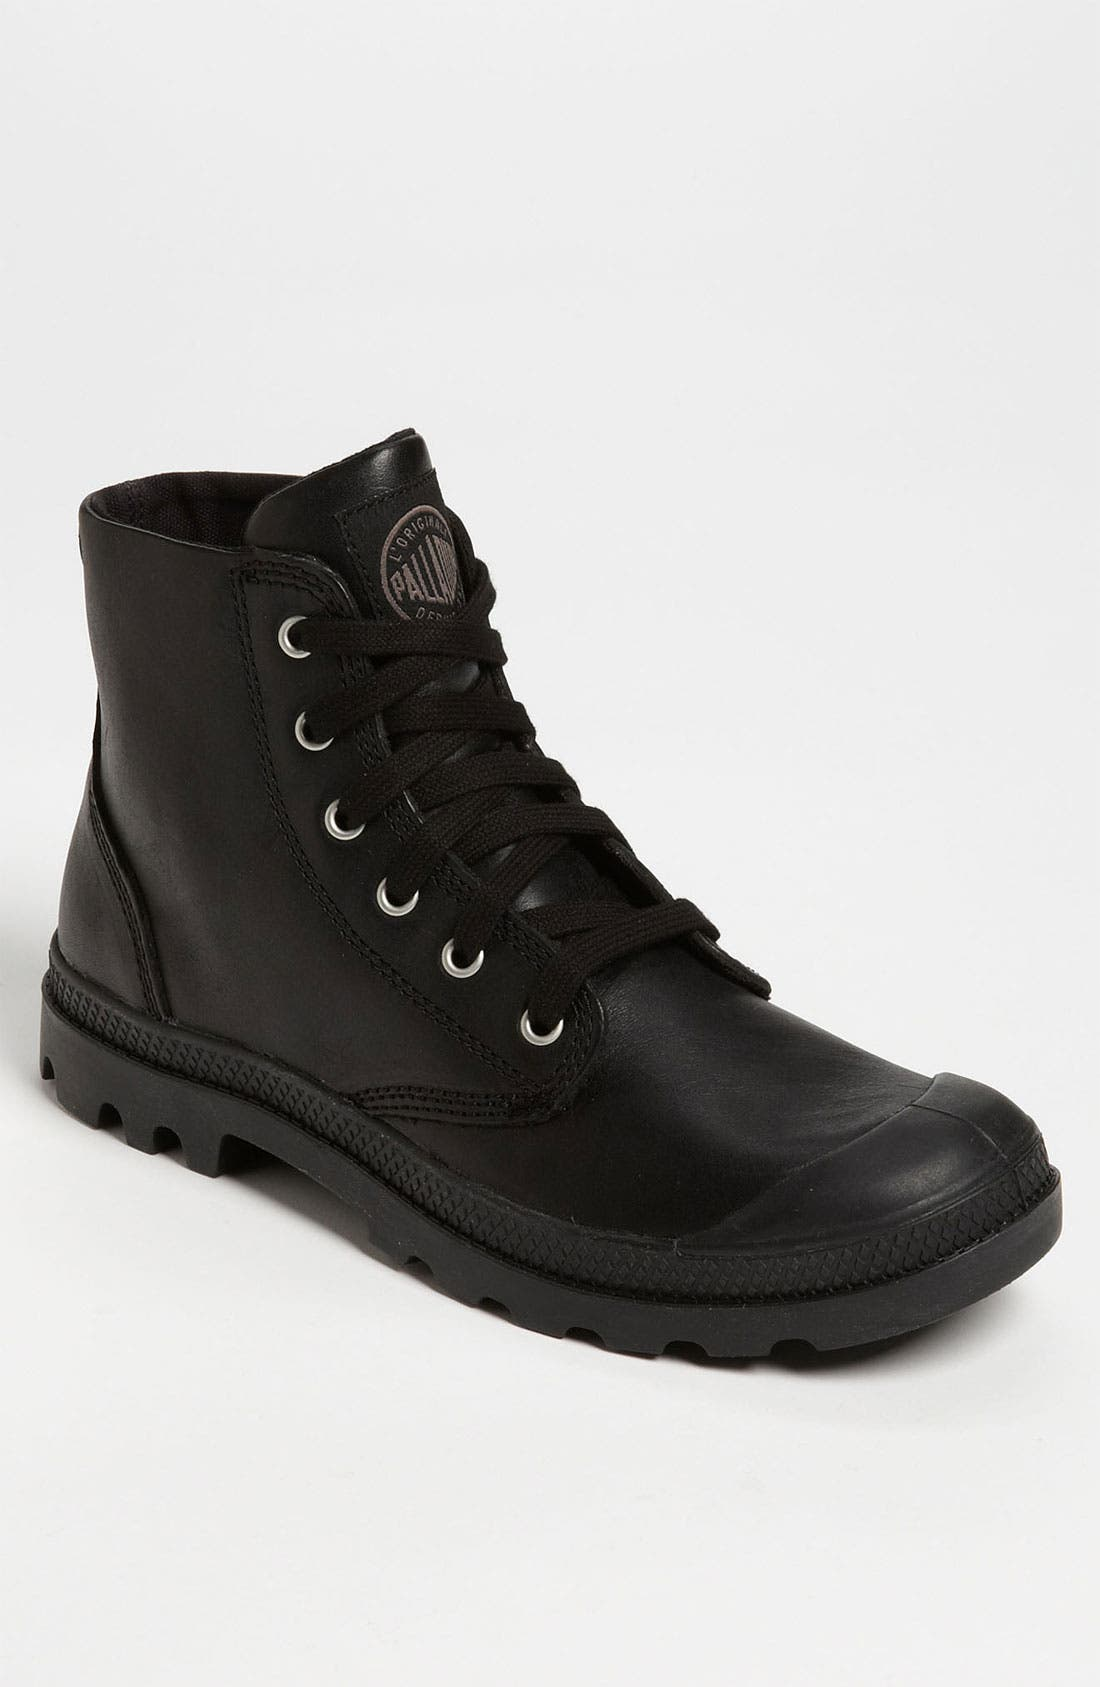 Main Image - Palladium 'Pampa Hi' Leather Boot